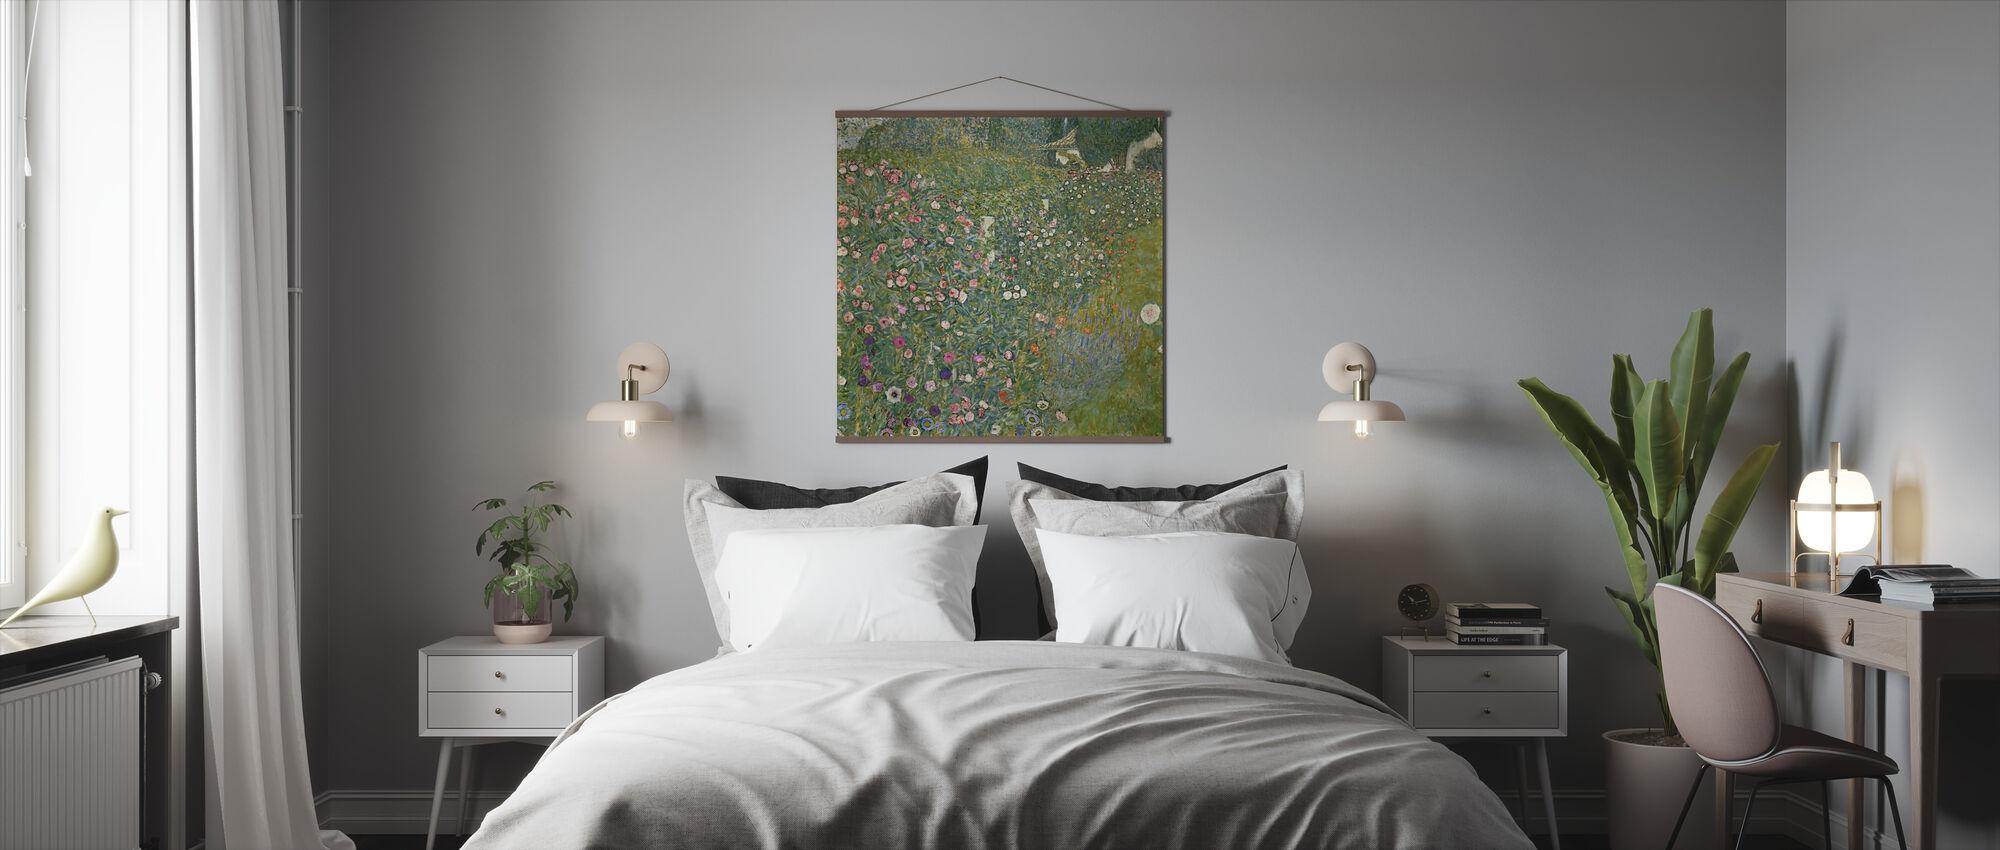 Klimt, Gustav - Paysage de jardin italien - Affiche - Chambre